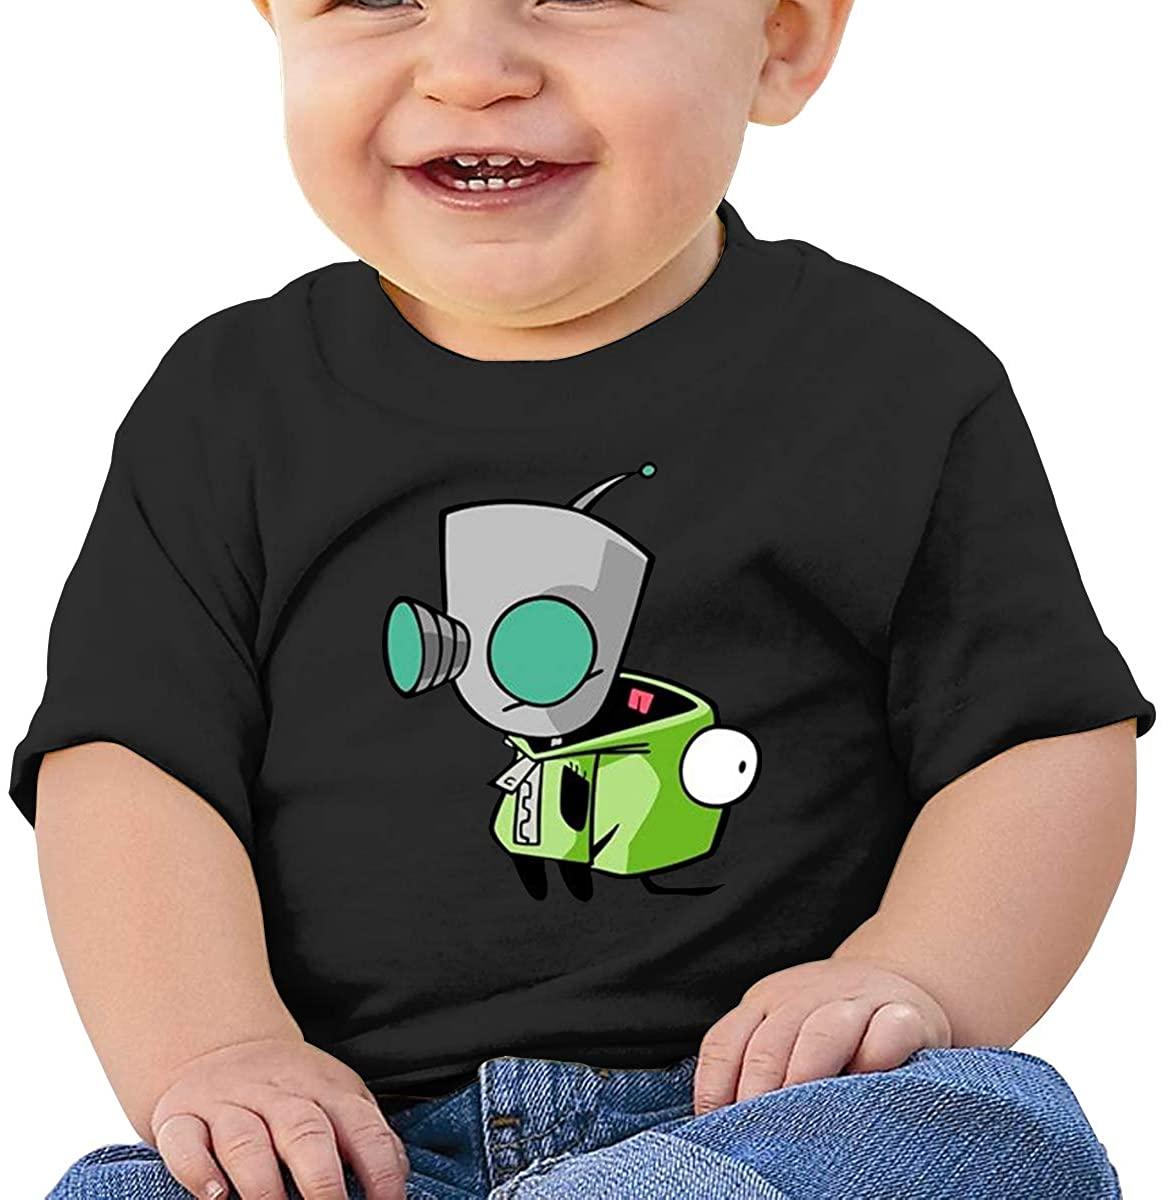 6-24 Months Boy and Girl Baby Short Sleeve T-Shirt Invader Zim Gir Doom Logo Original Minimalist Style Black